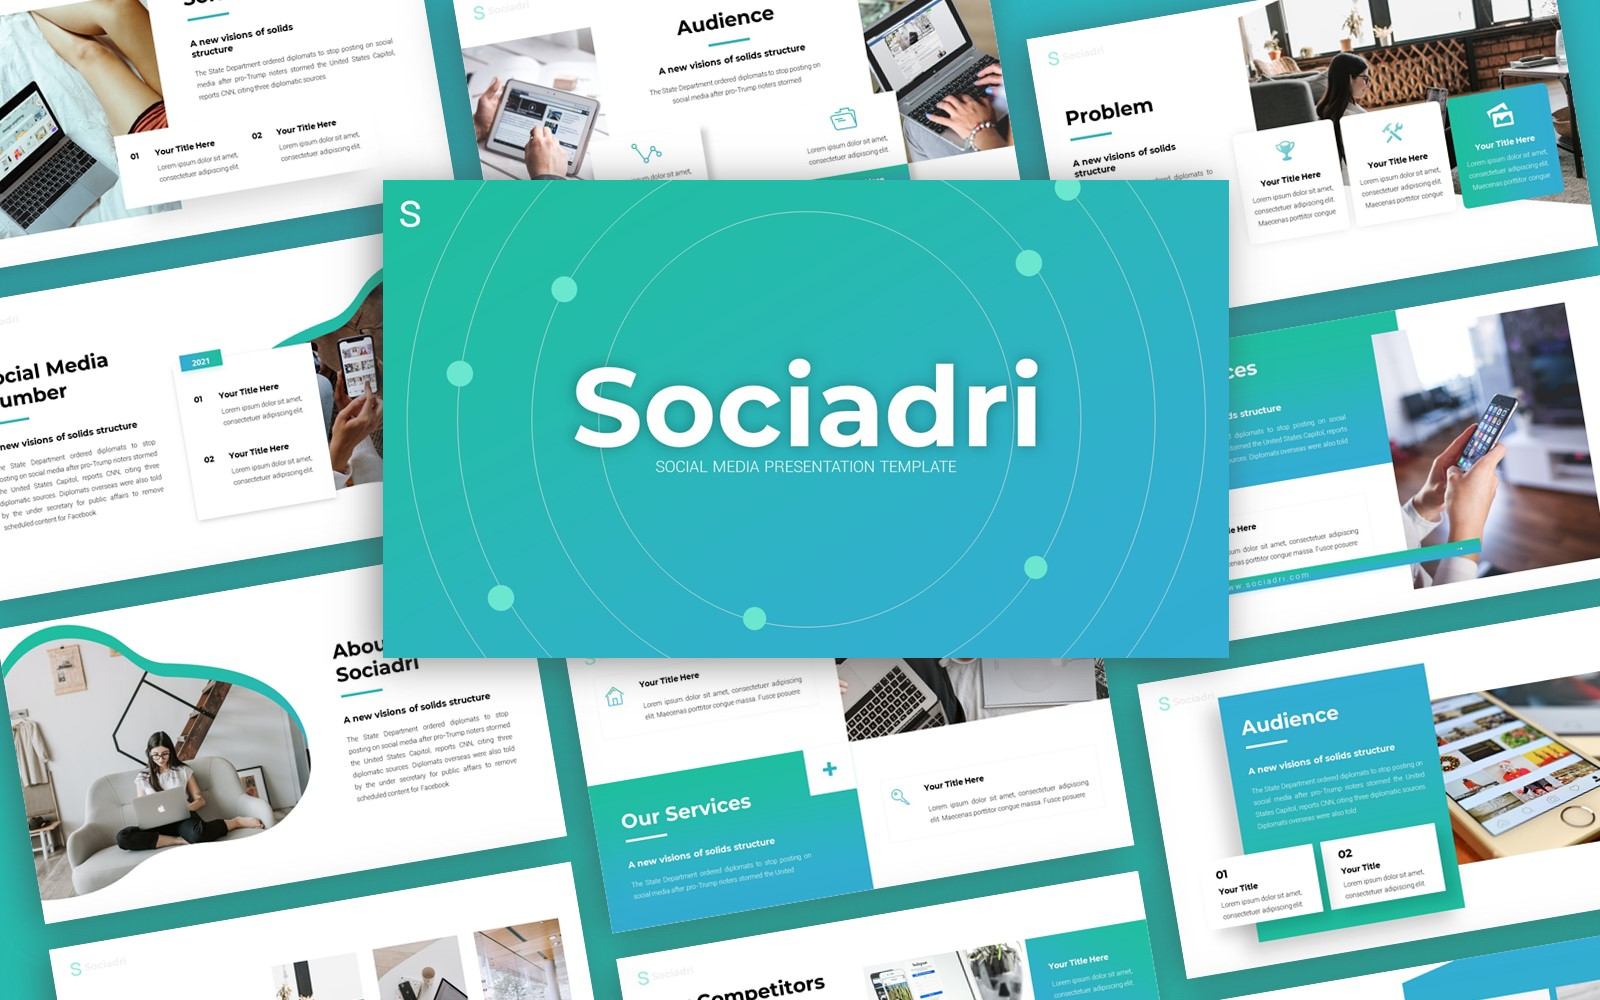 Sociadri Social Media Presentation PowerPoint Template